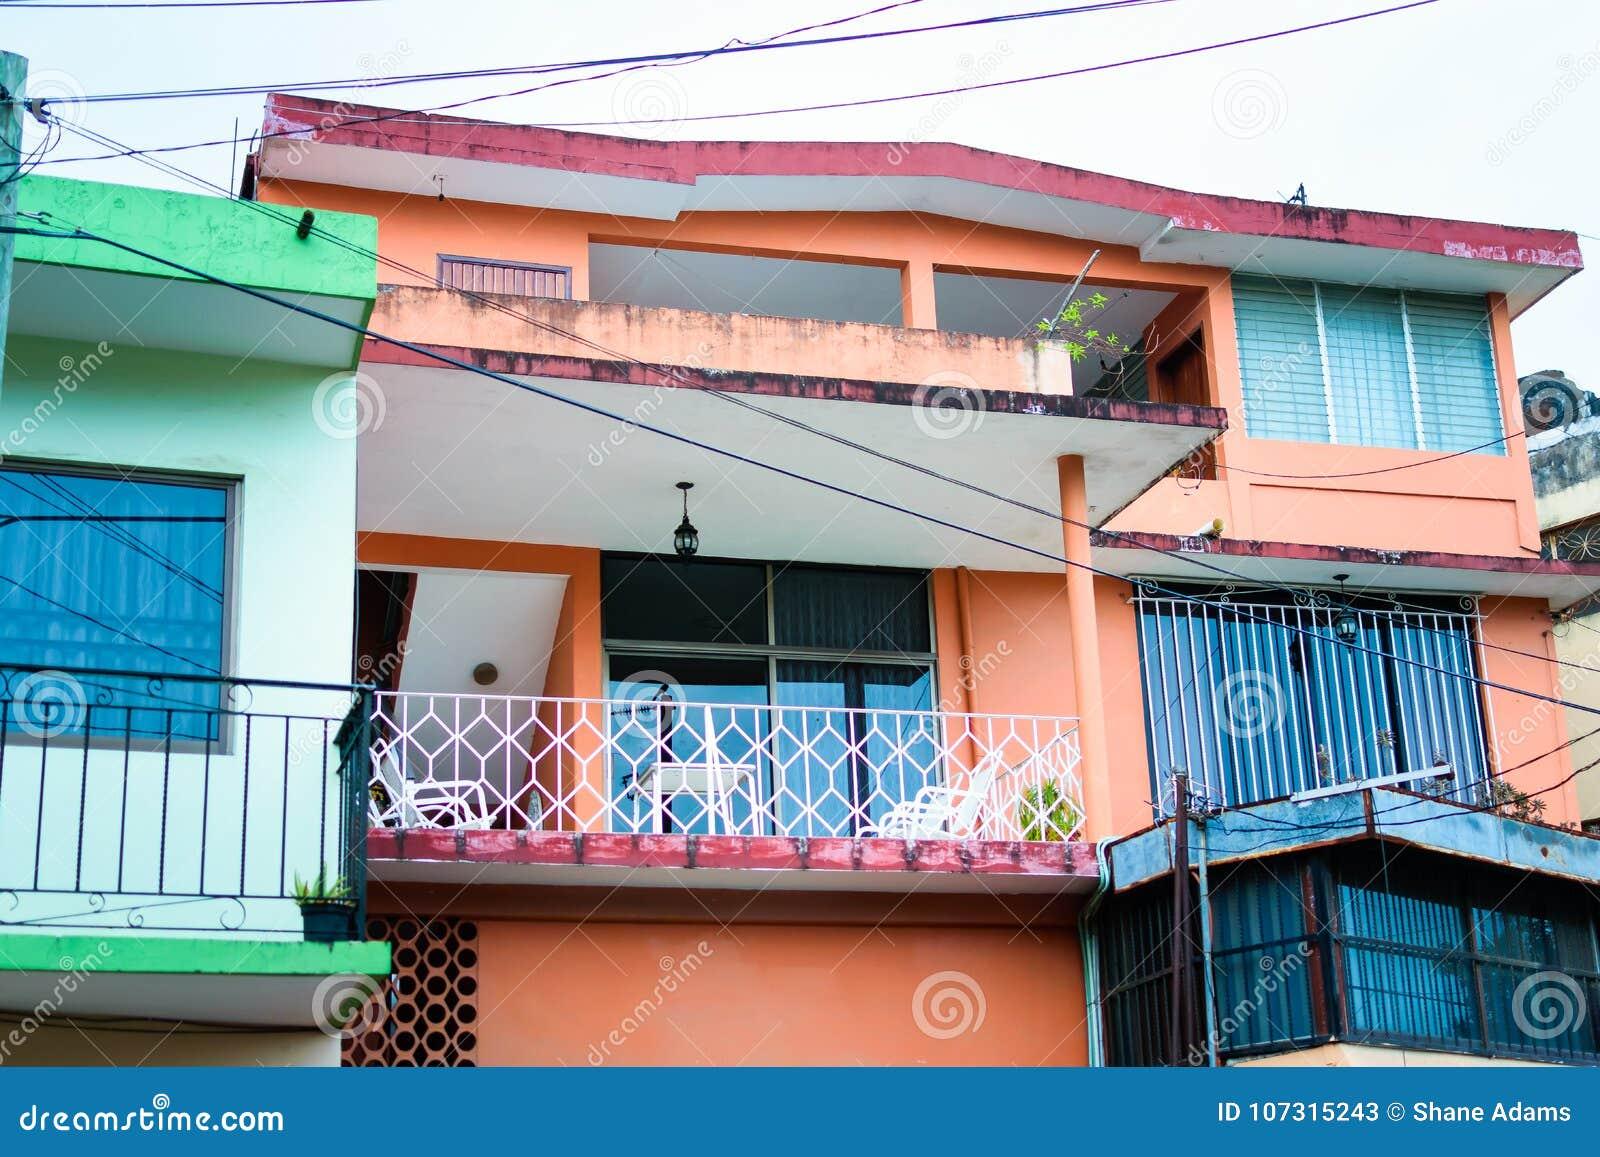 Mexikanisches Haus